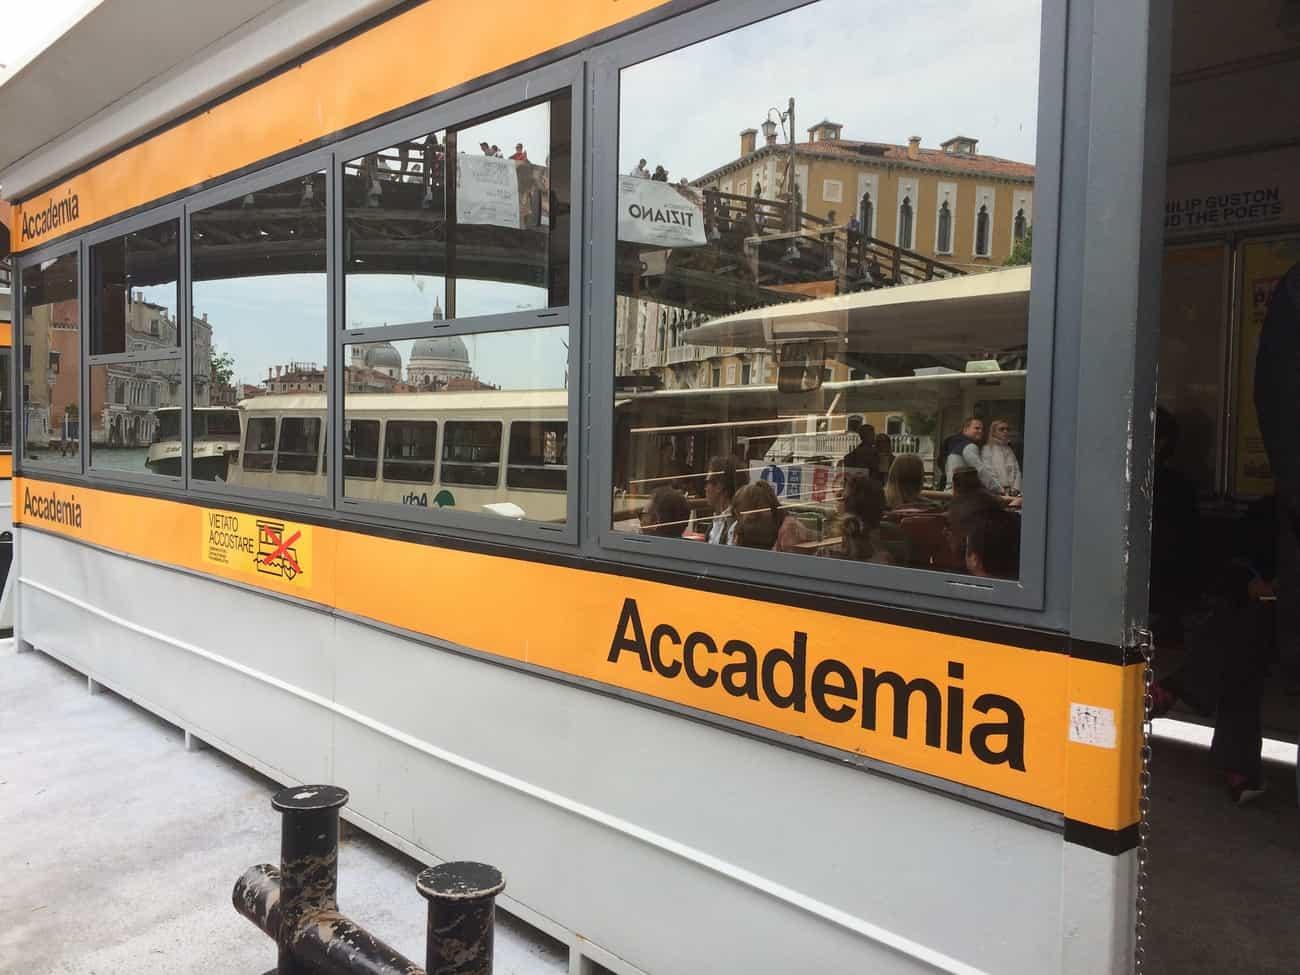 Venice vaporetto stop Accademia